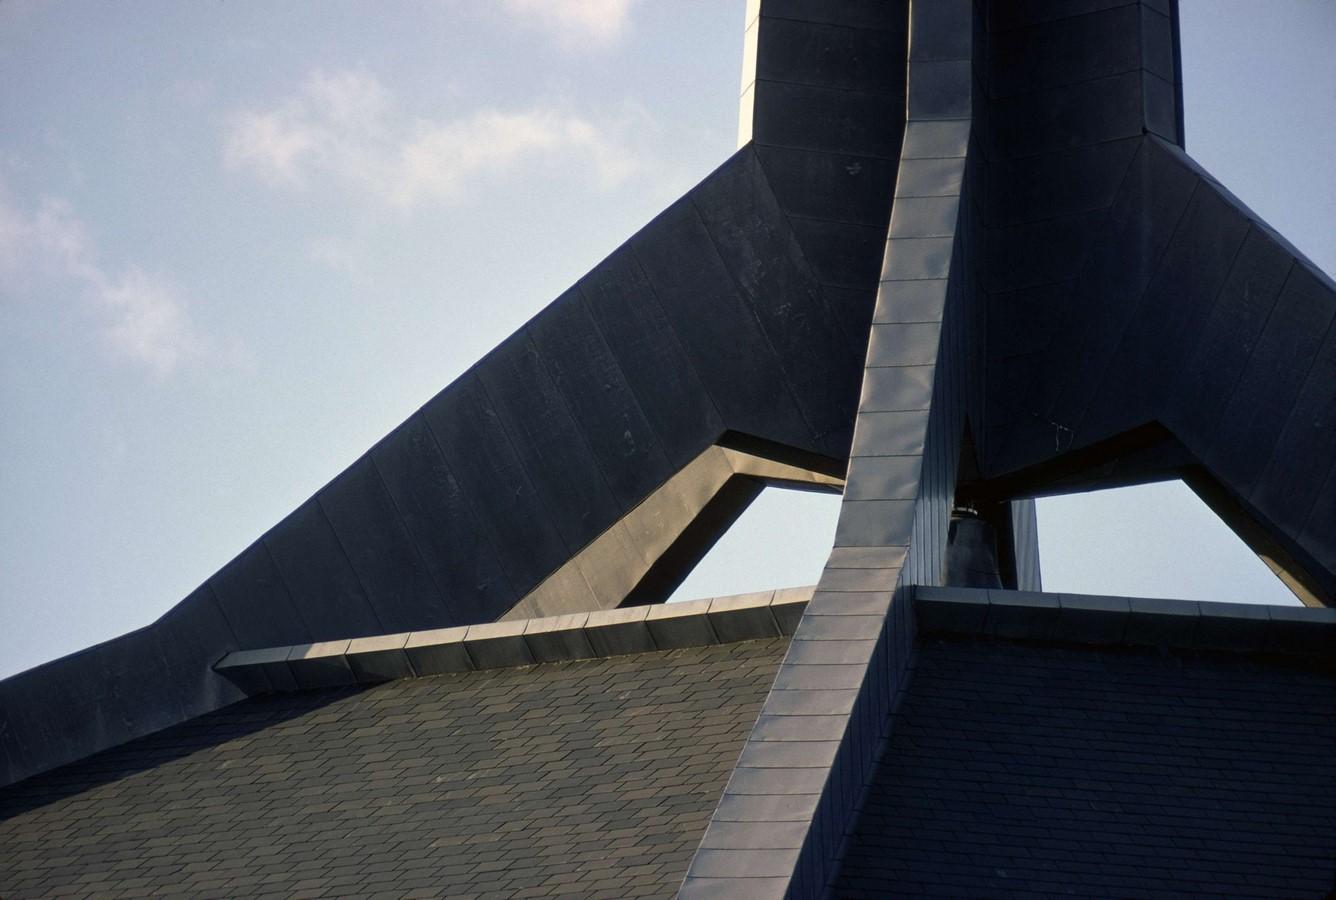 North Christian Church by Eero Saarinen: Church inspired from Angkor Wat and Borobudur - Sheet11